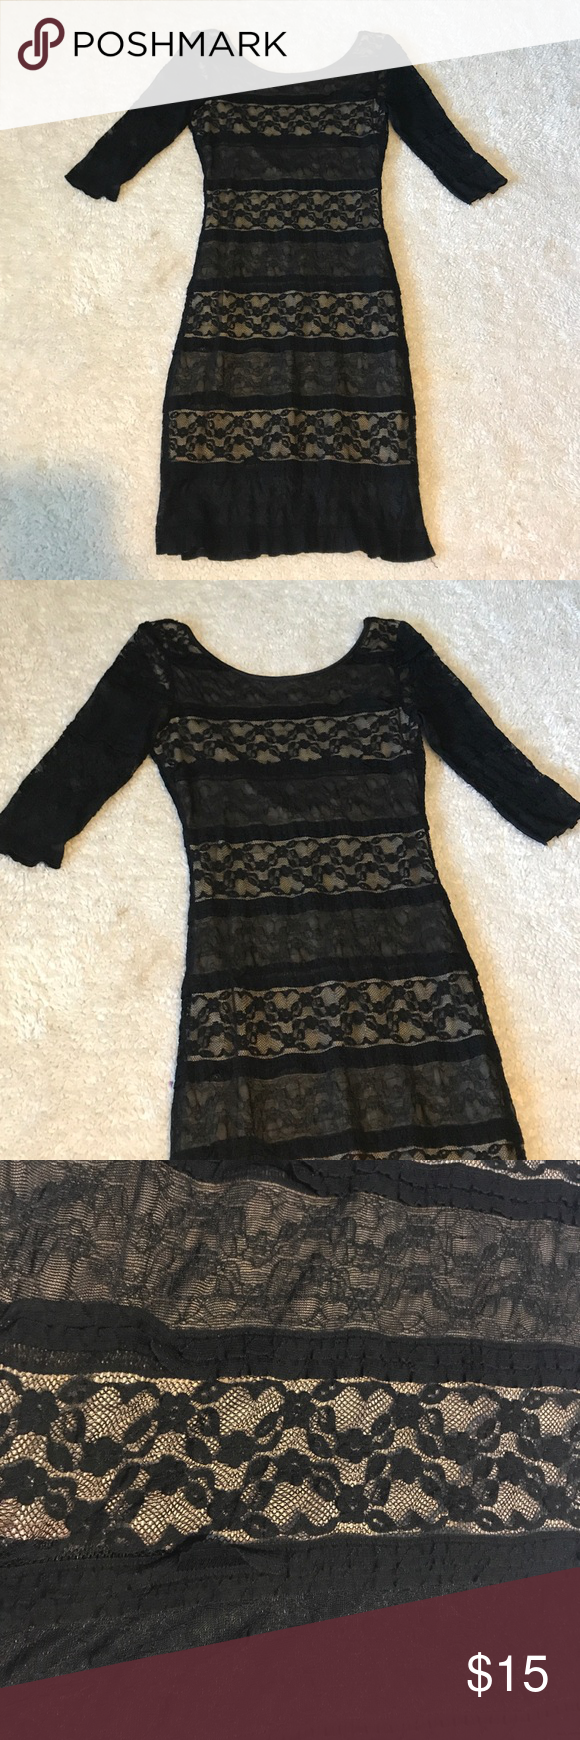 Lace Dress With Scoop Neckline 3 4 Sleeve Dress Windsor Dresses Long Sleeve Clothes Design Lace Dress 3 4 Sleeve Dress [ 1740 x 580 Pixel ]